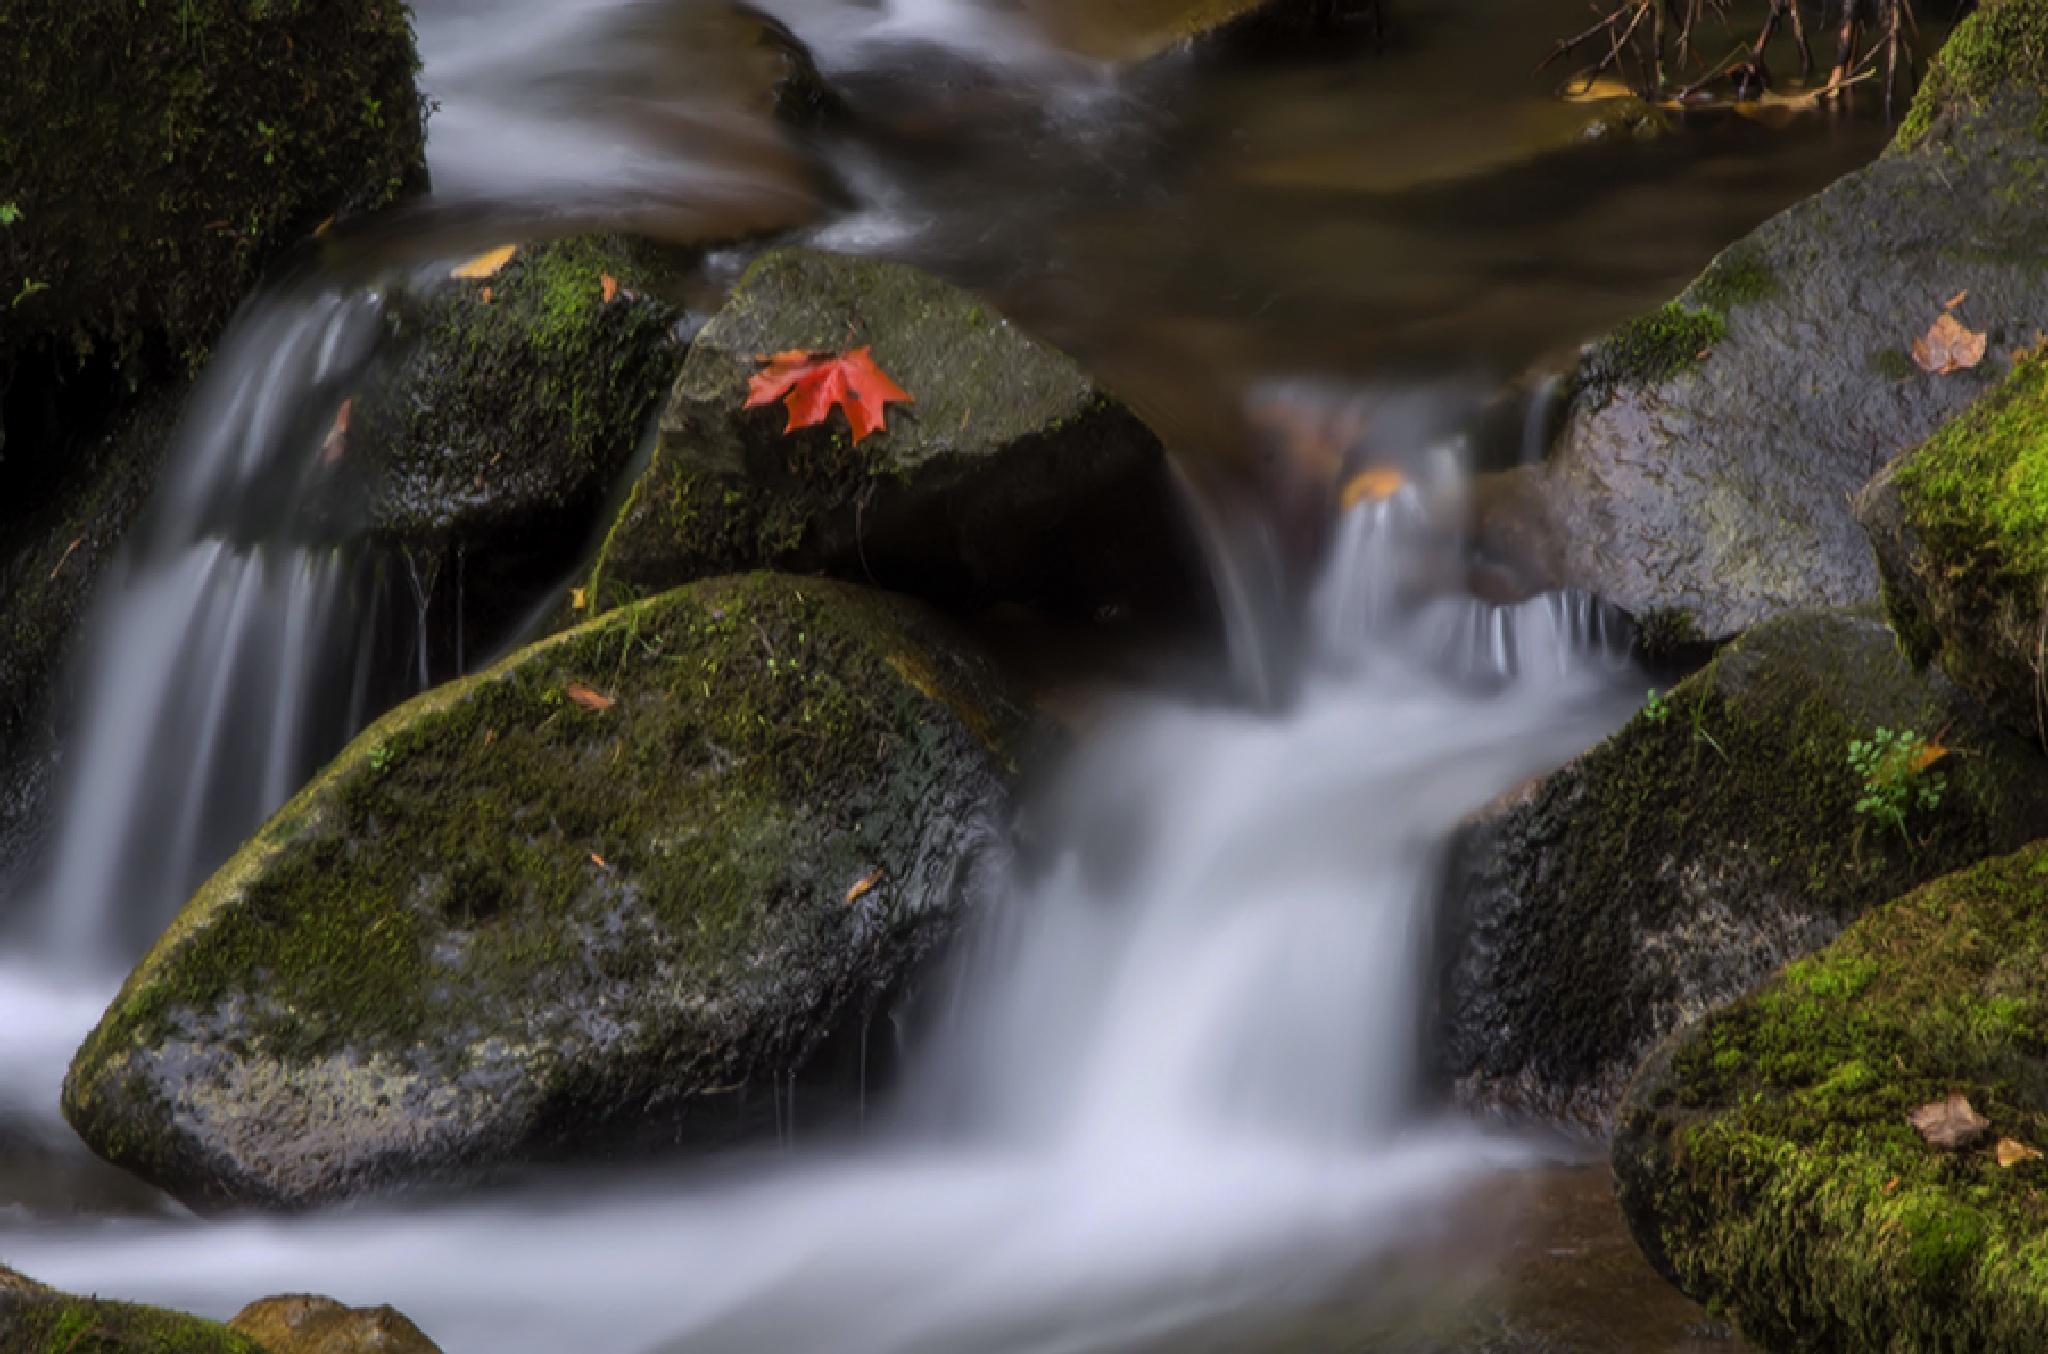 Autumn simplicity by MadeleineGuenette